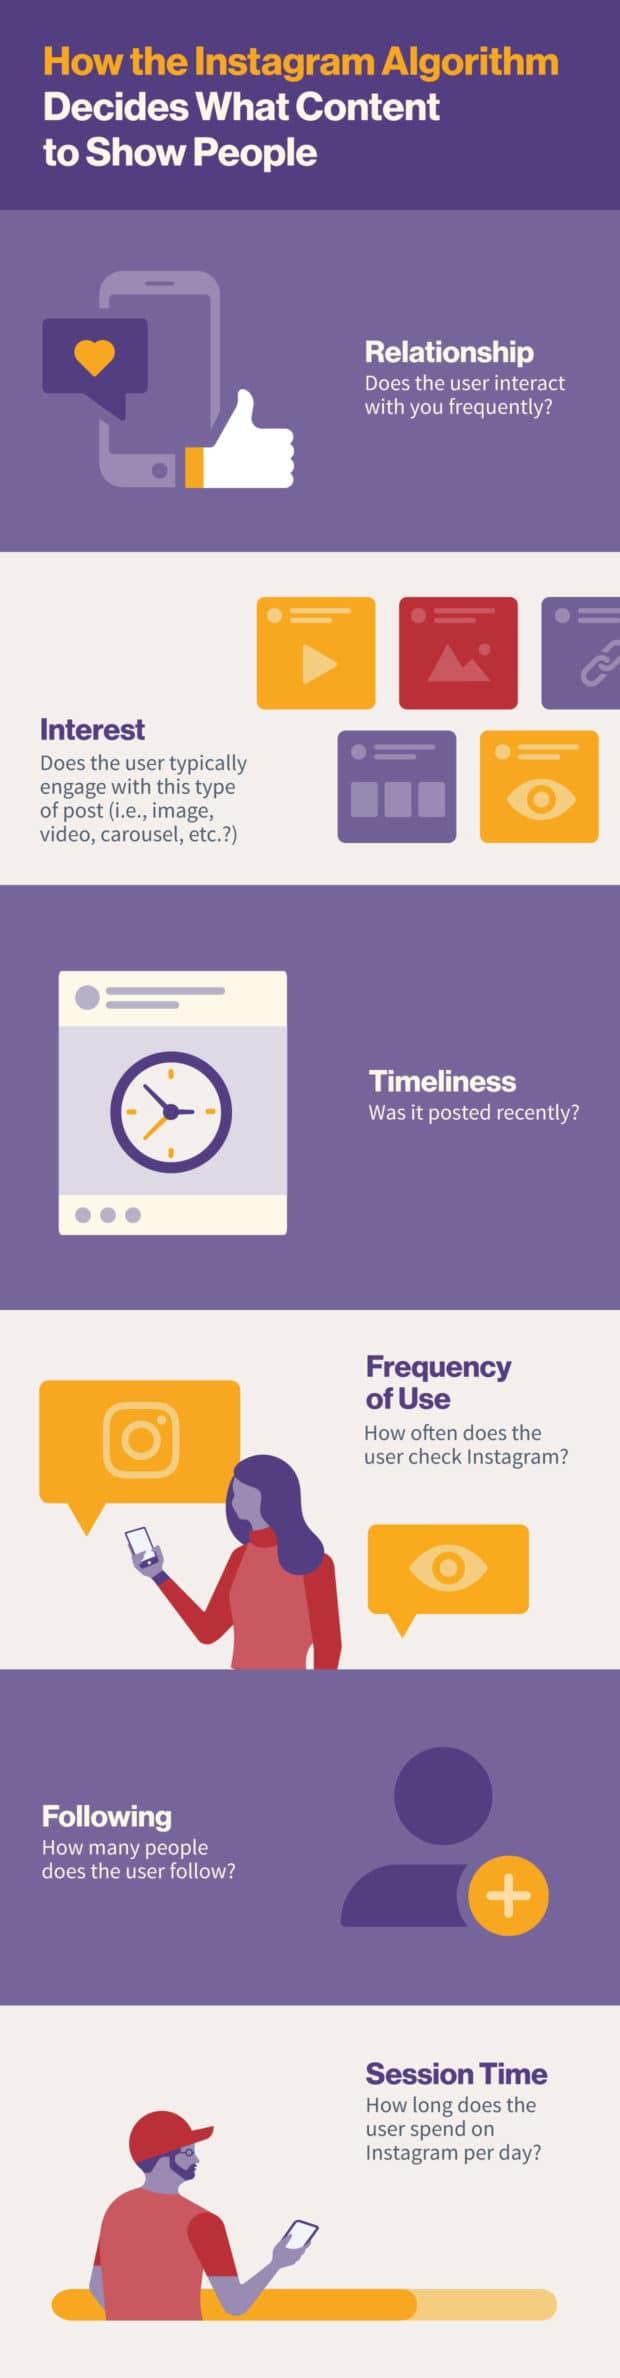 infographic: Instagram algorithm ranking factors